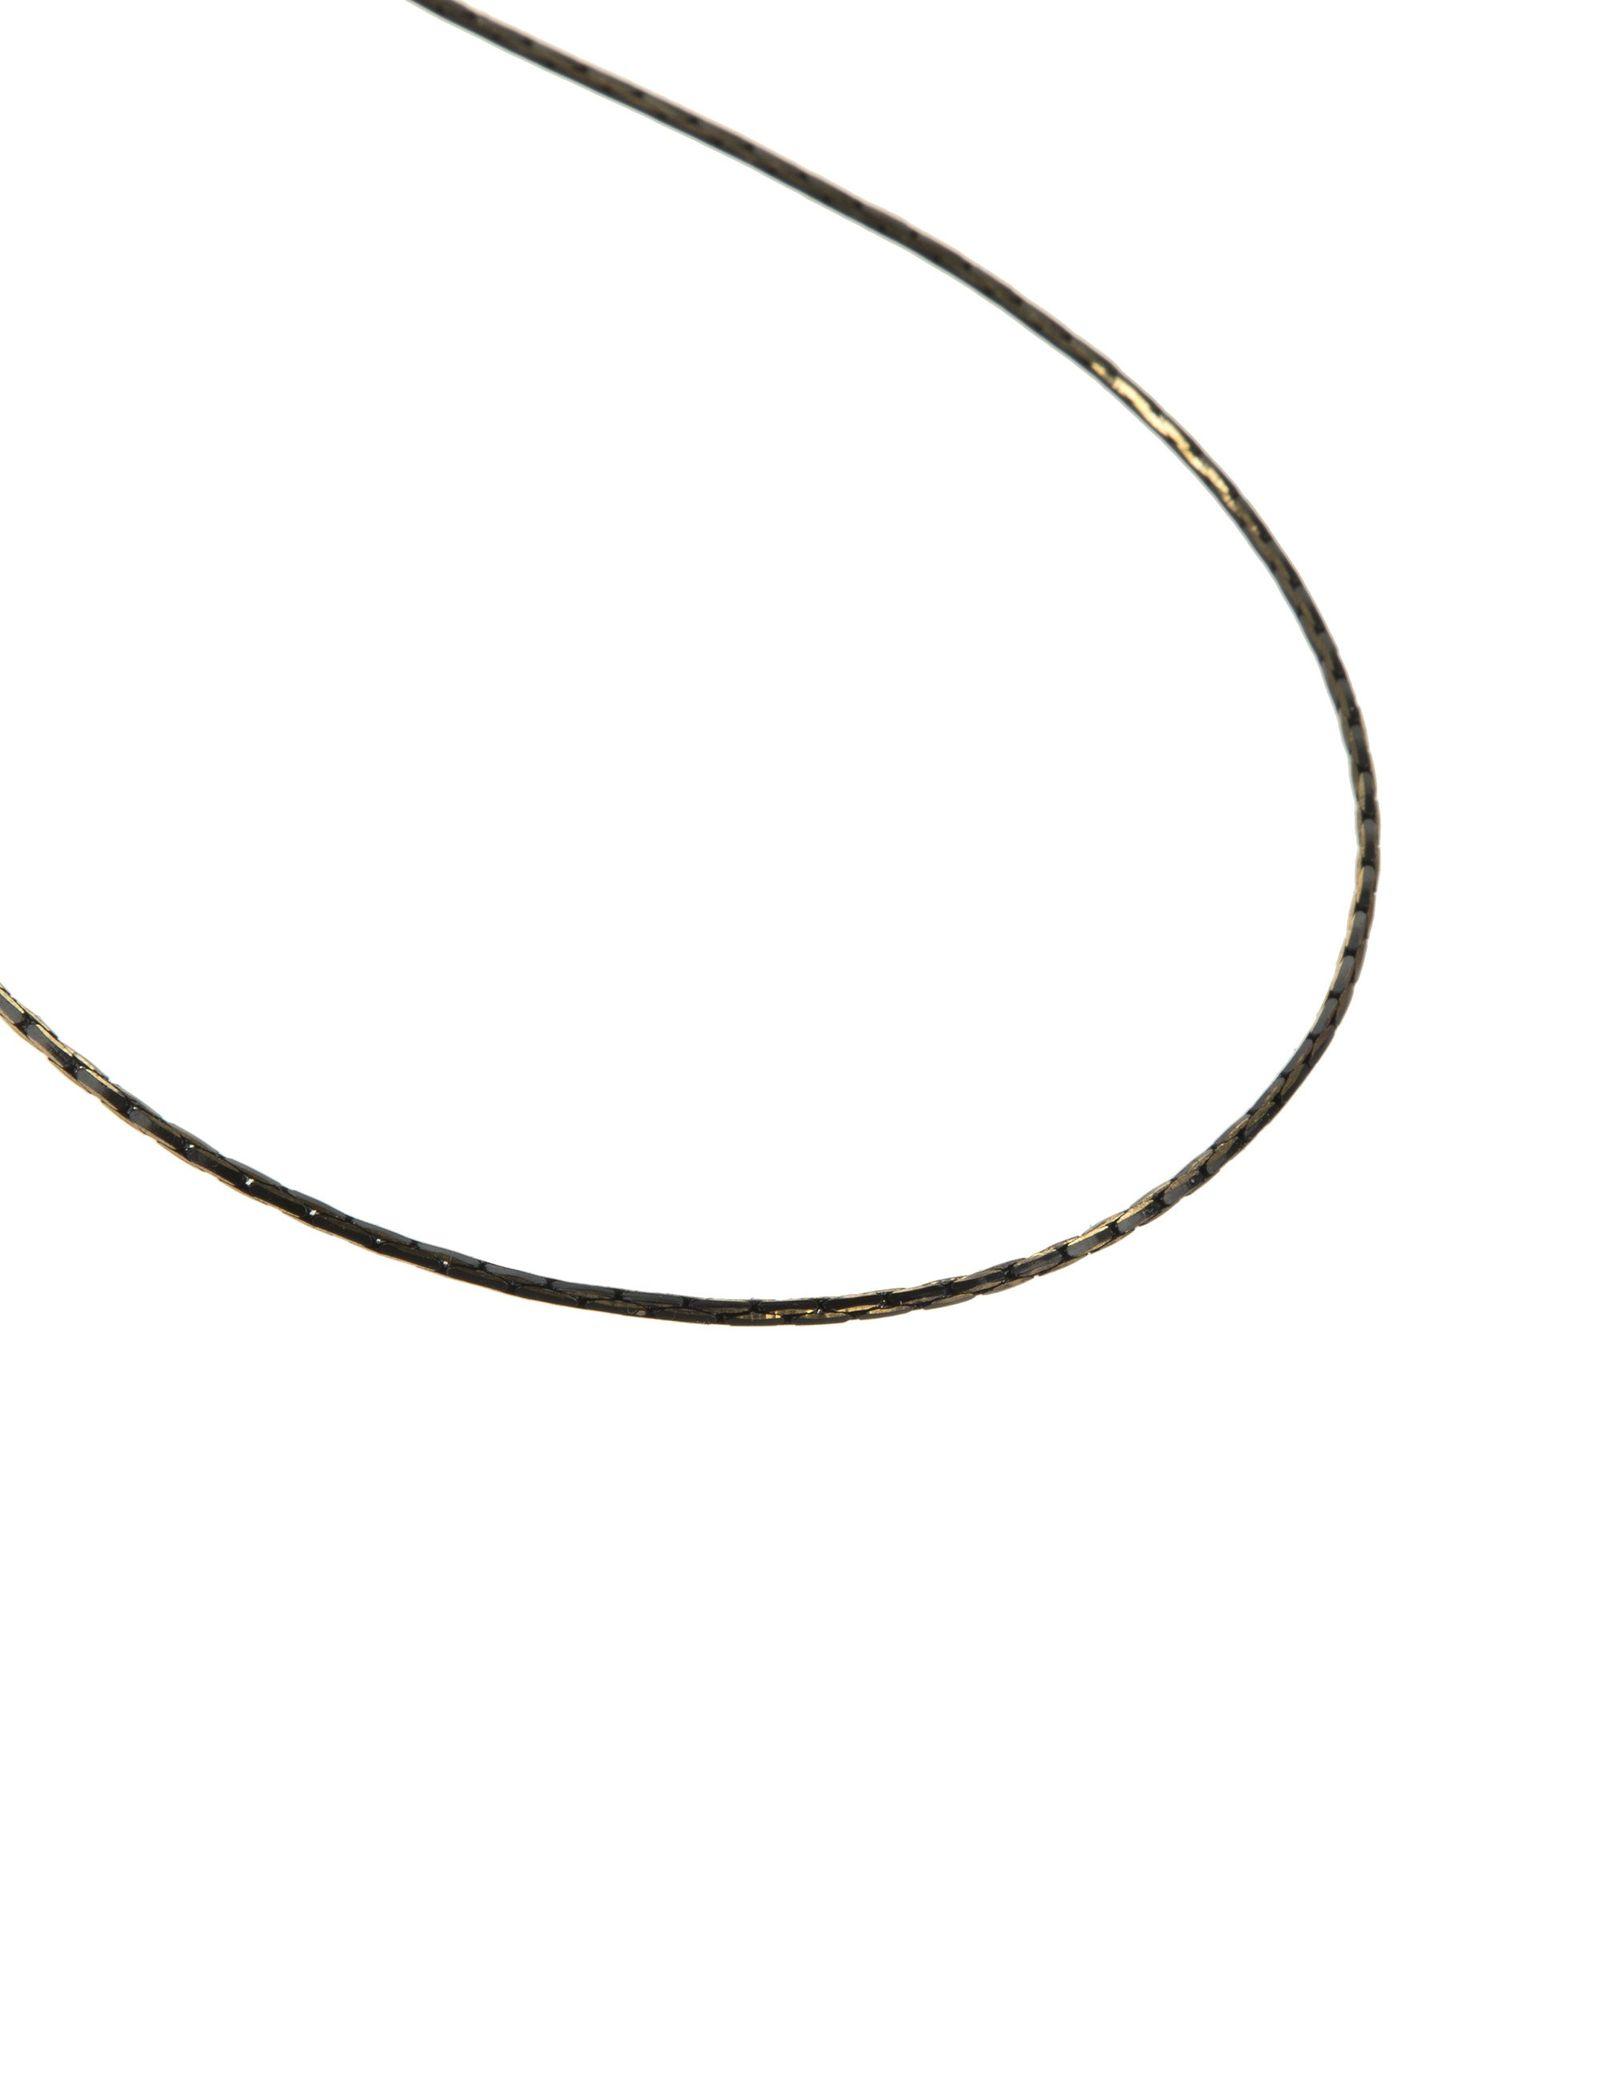 گردنبند آویز زنانه - پونت روما تک سایز - طوسي طلايي - 6